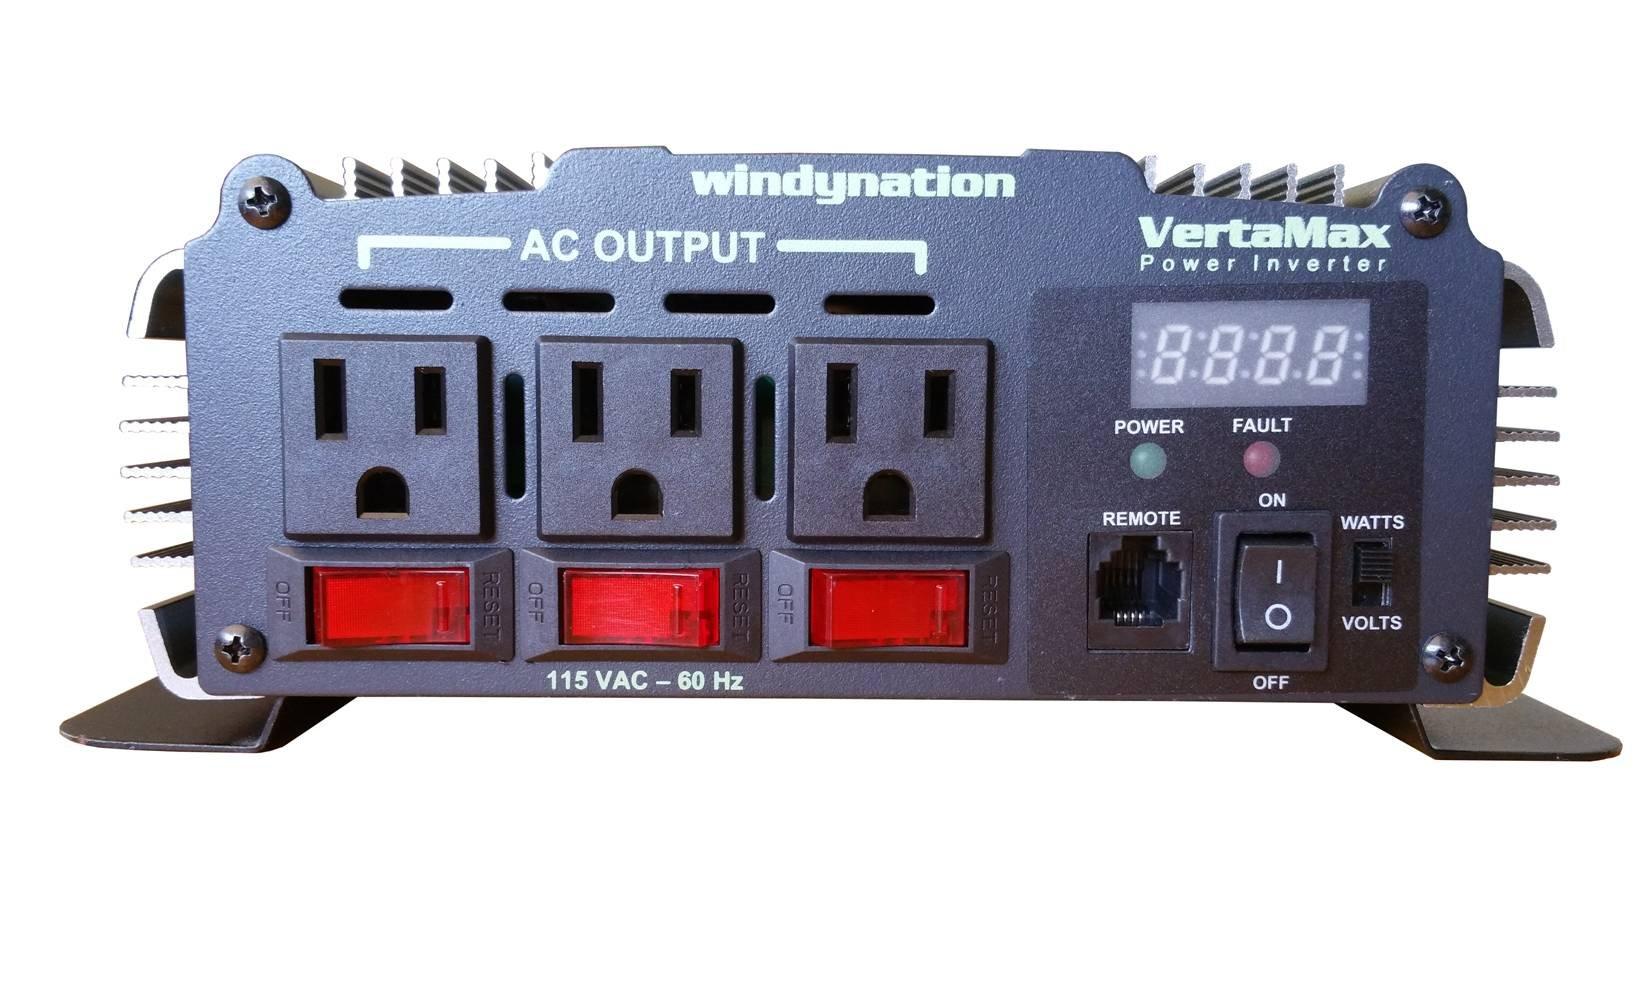 VertaMax PURE SINE WAVE 1500 Watt (3000W Surge) 12V Power Inverter DC to 115 AC Car, Solar, Off-Grid, RV, Back Up Power by WindyNation (Image #2)